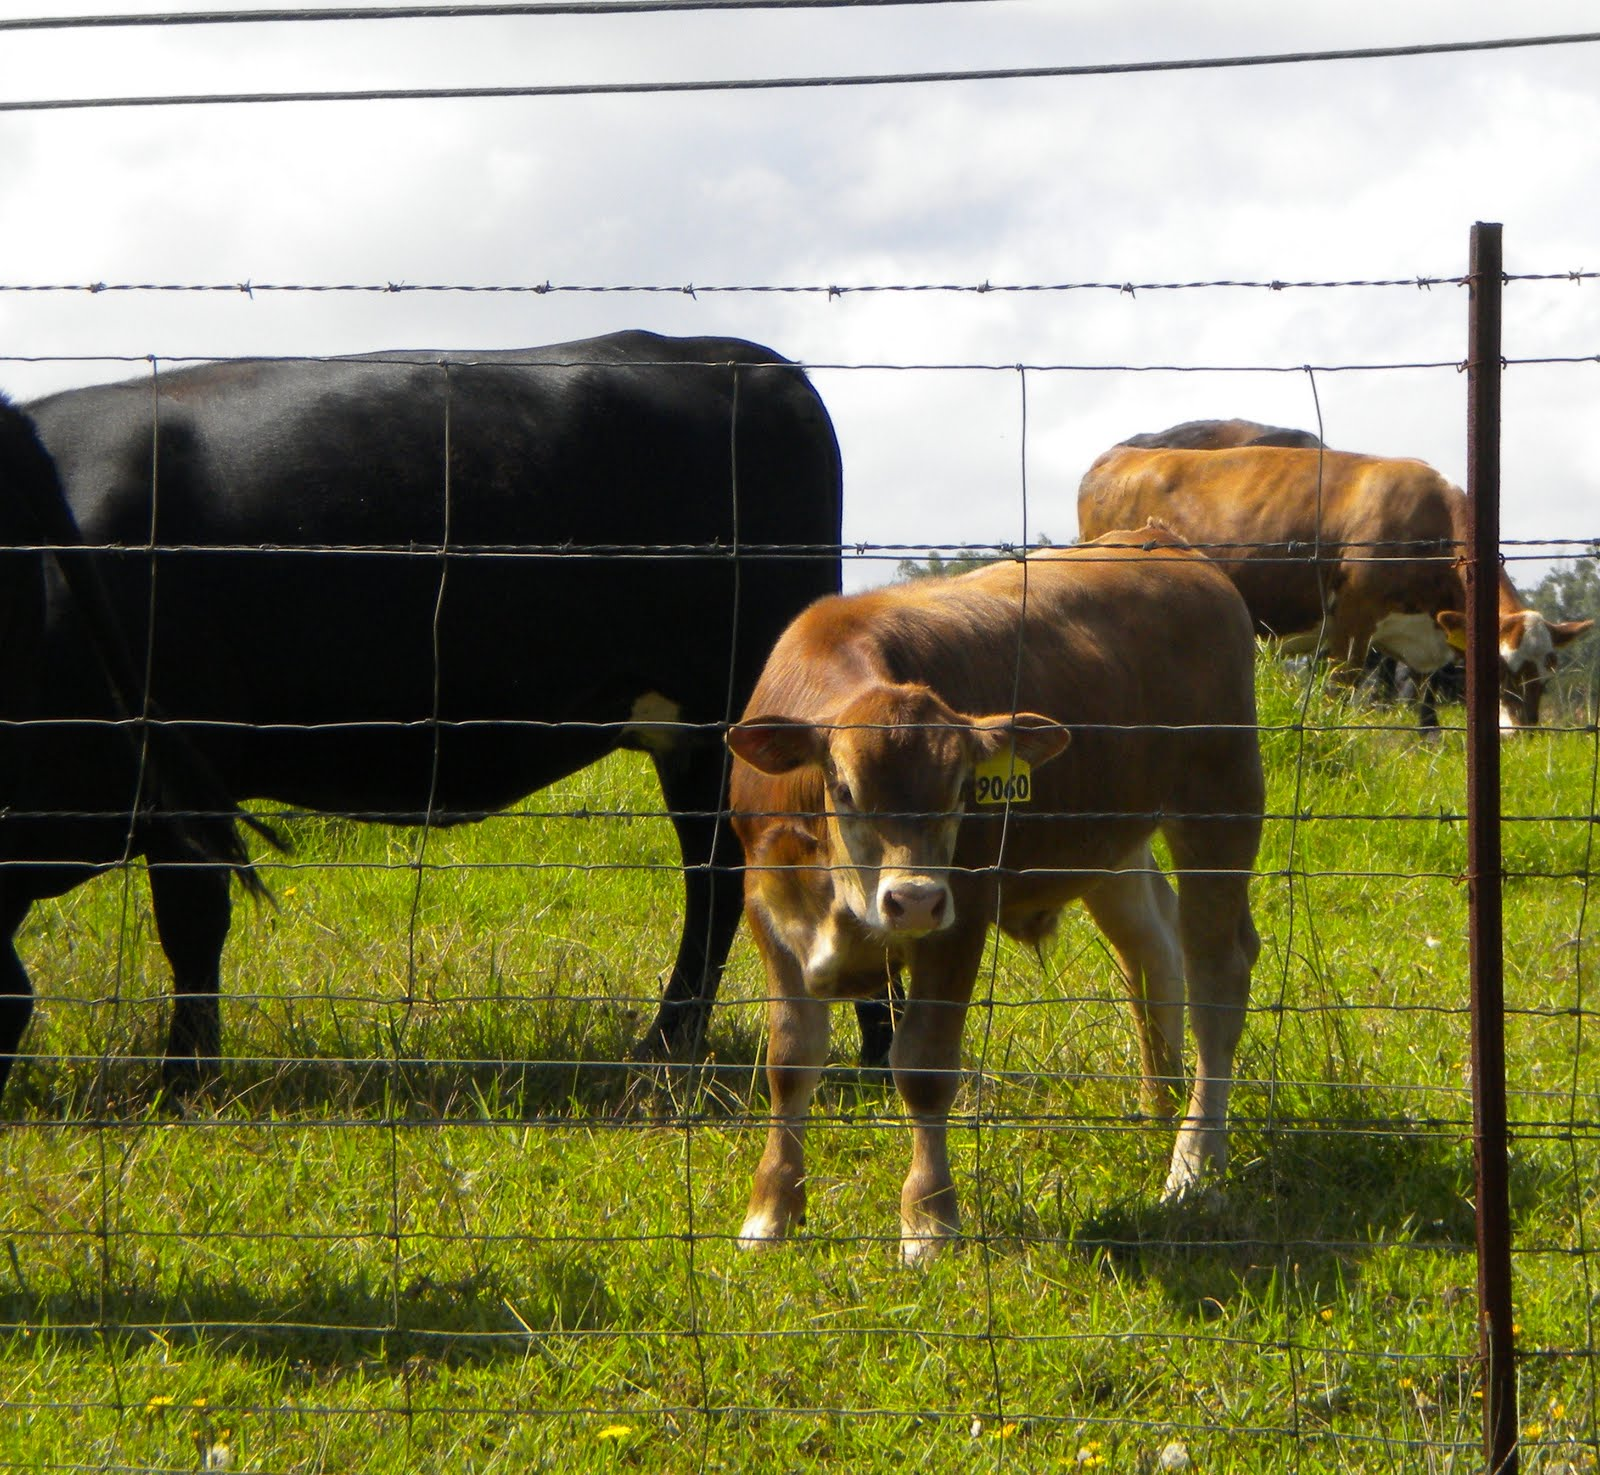 Human cattle smut scenes